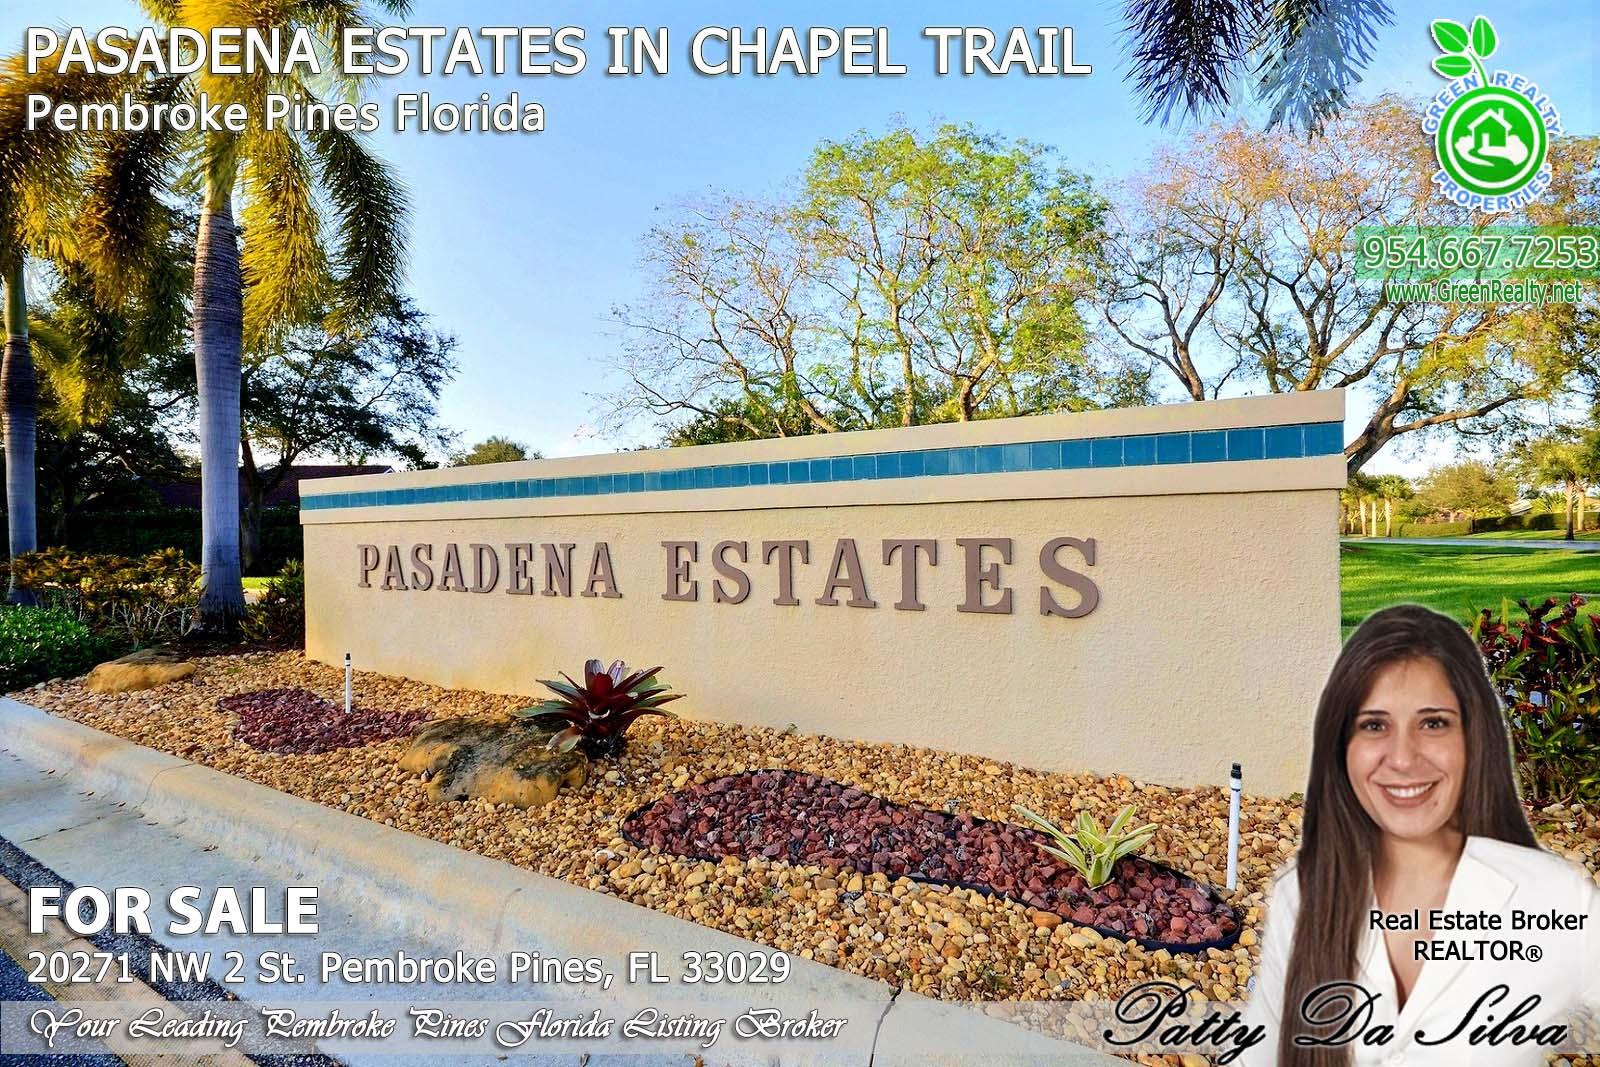 Pasadena Estates of Chapel Trail - Pembroke Pines FL sell home